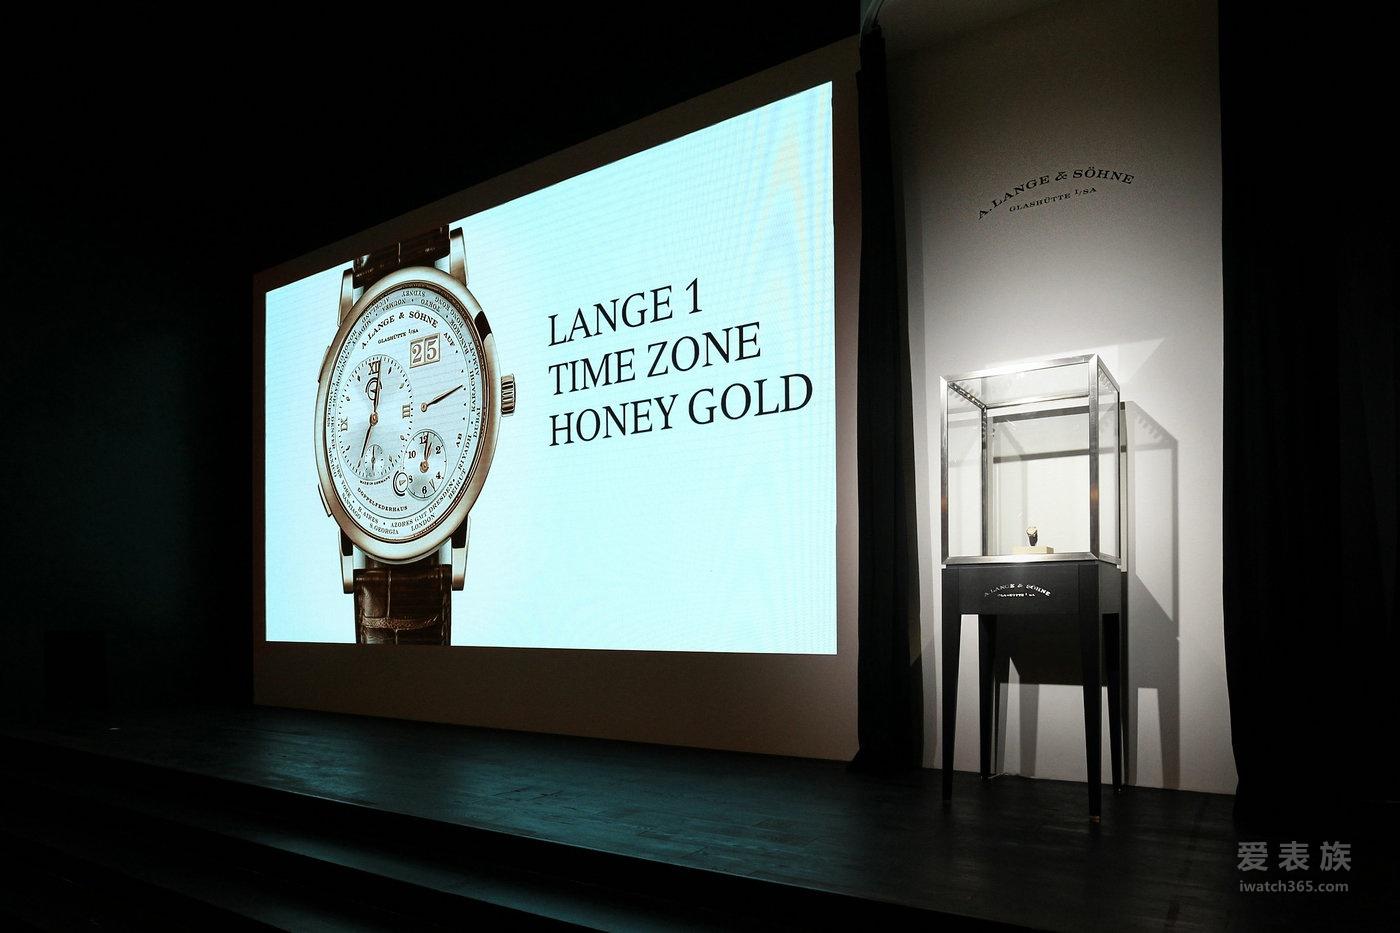 LANGE 1 TIME ZONE 蜂蜜金特别版问世 朗格携手德国国家旅游局呈献德国灵感宝地